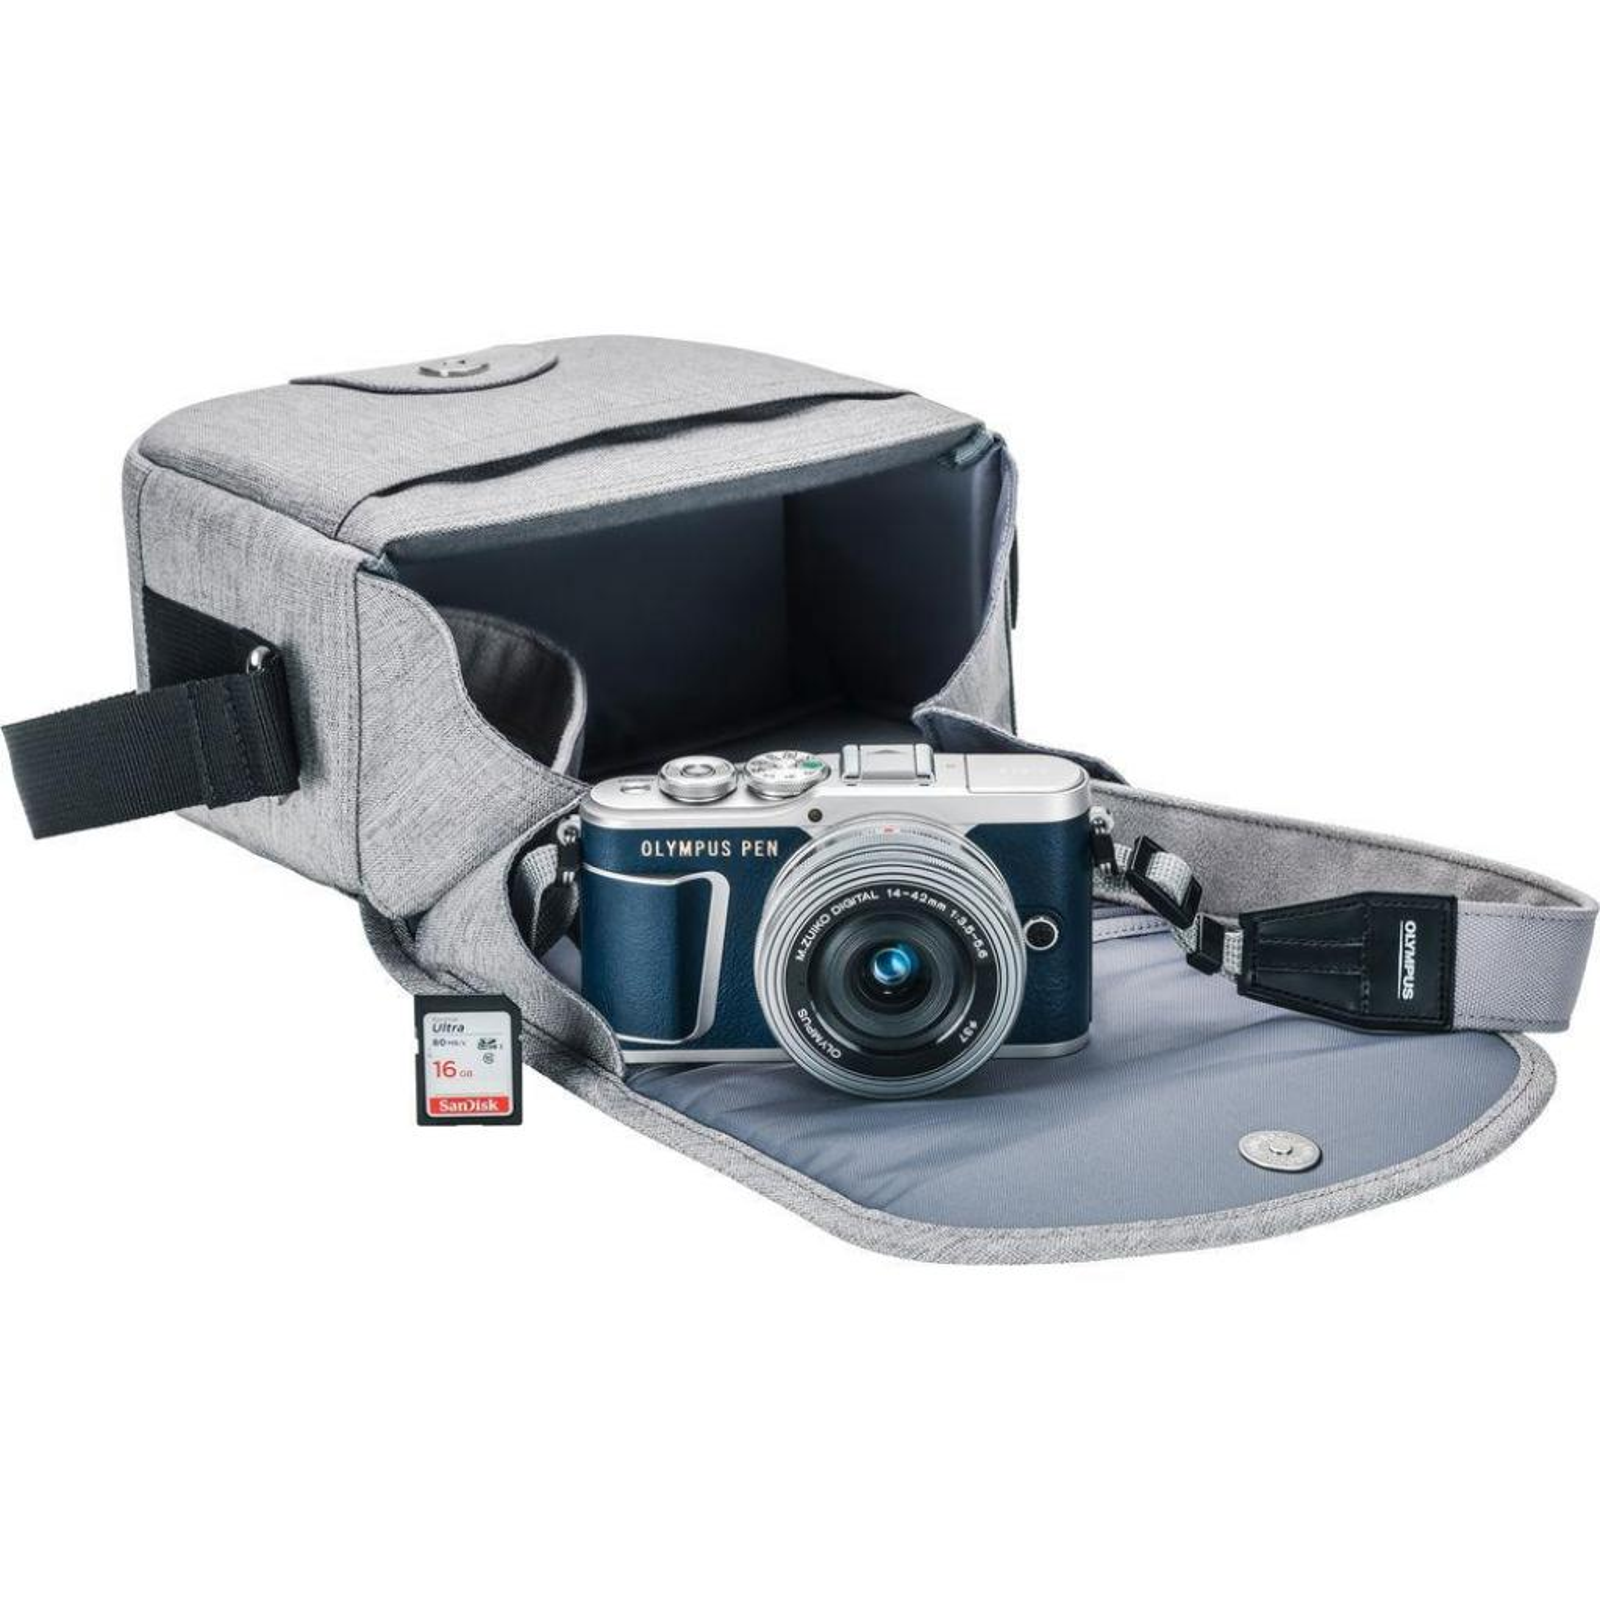 Цифровой фотоаппарат OLYMPUS E-PL9 14-42 mm Pancake Zoom Kit blue/silver (V205092UE000) изображение 8